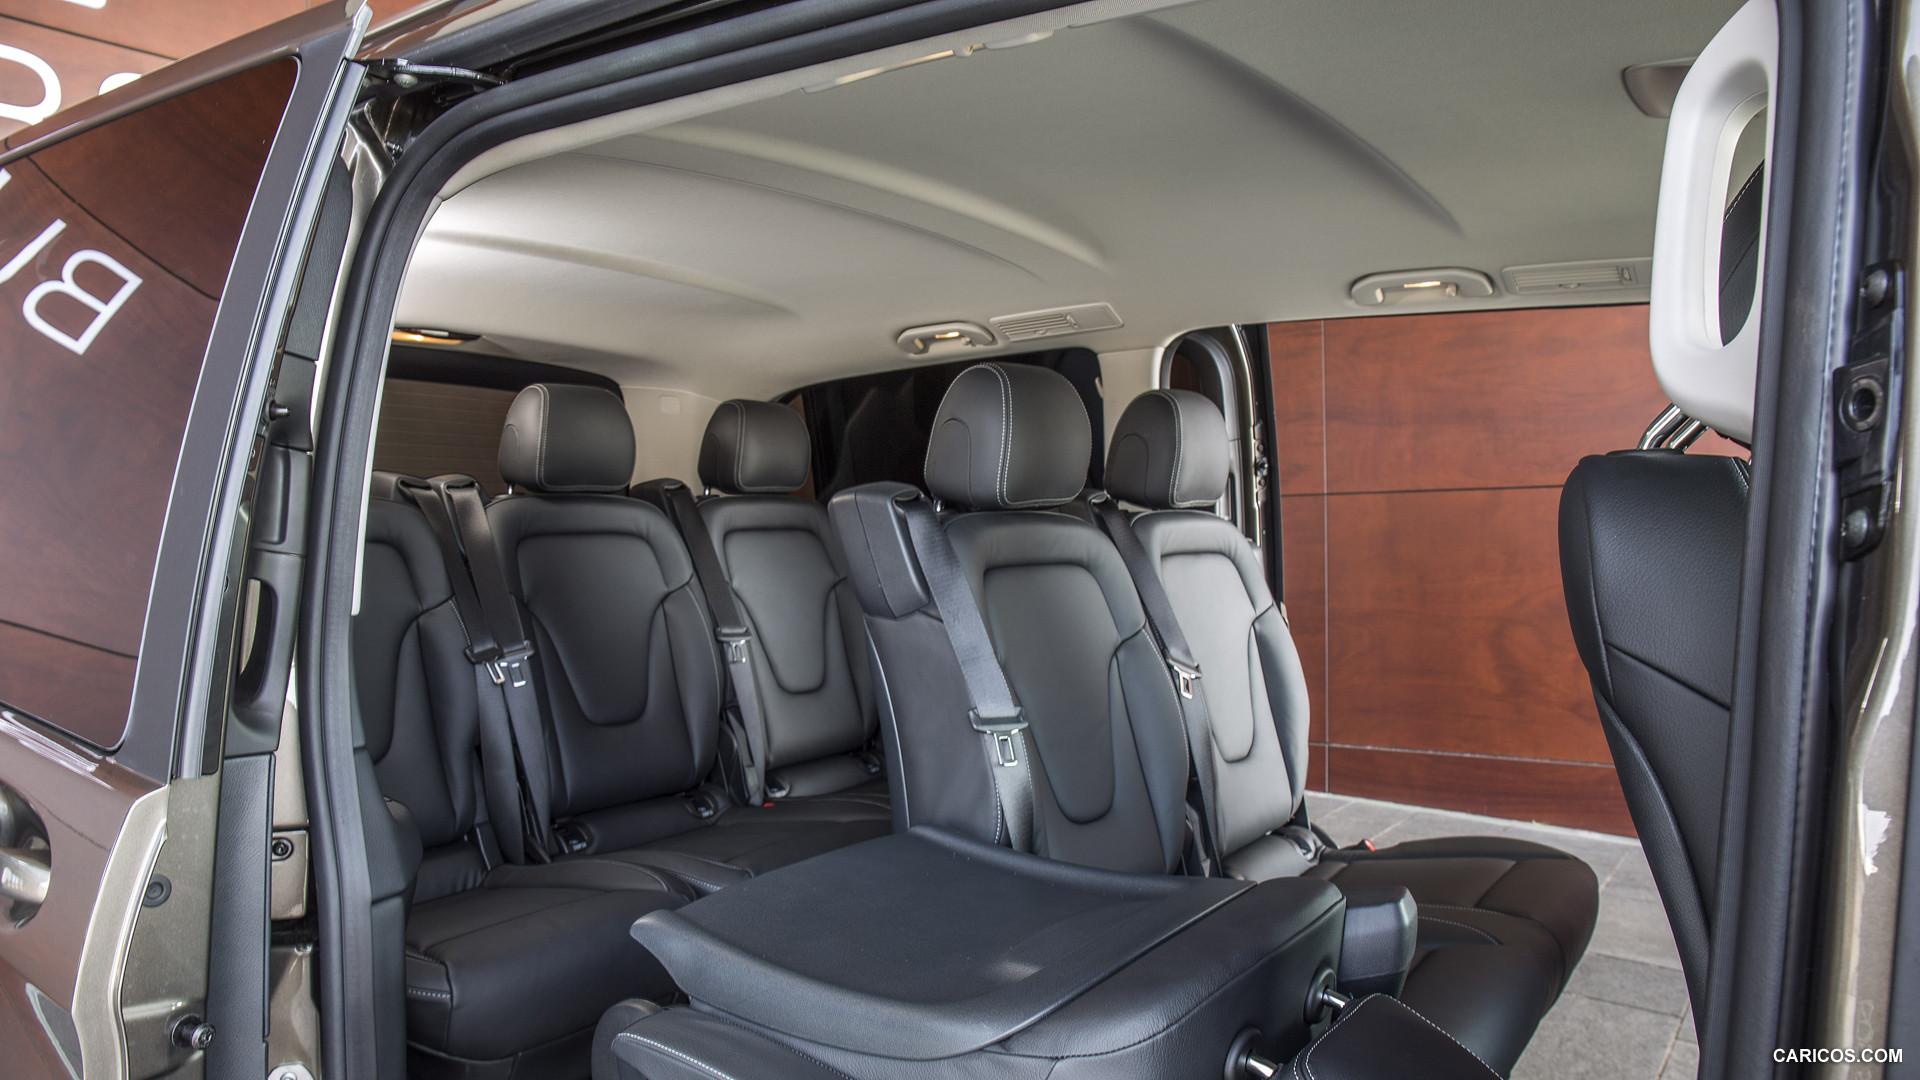 2015_mercedes-benz_v-class_Black seats_208_1920x1080.jpg